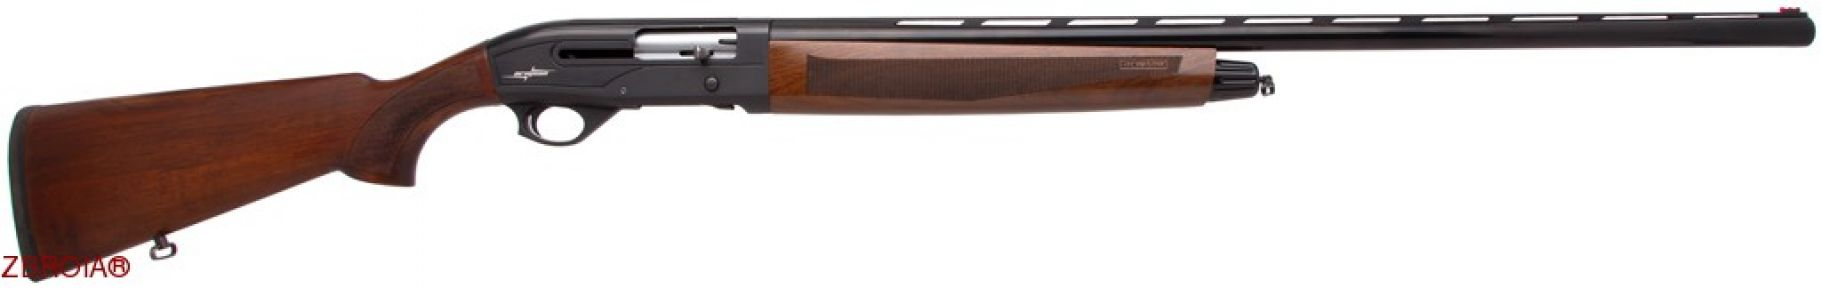 Ружье Armsan A612 W Standart Satin Walnut кал. 12/76